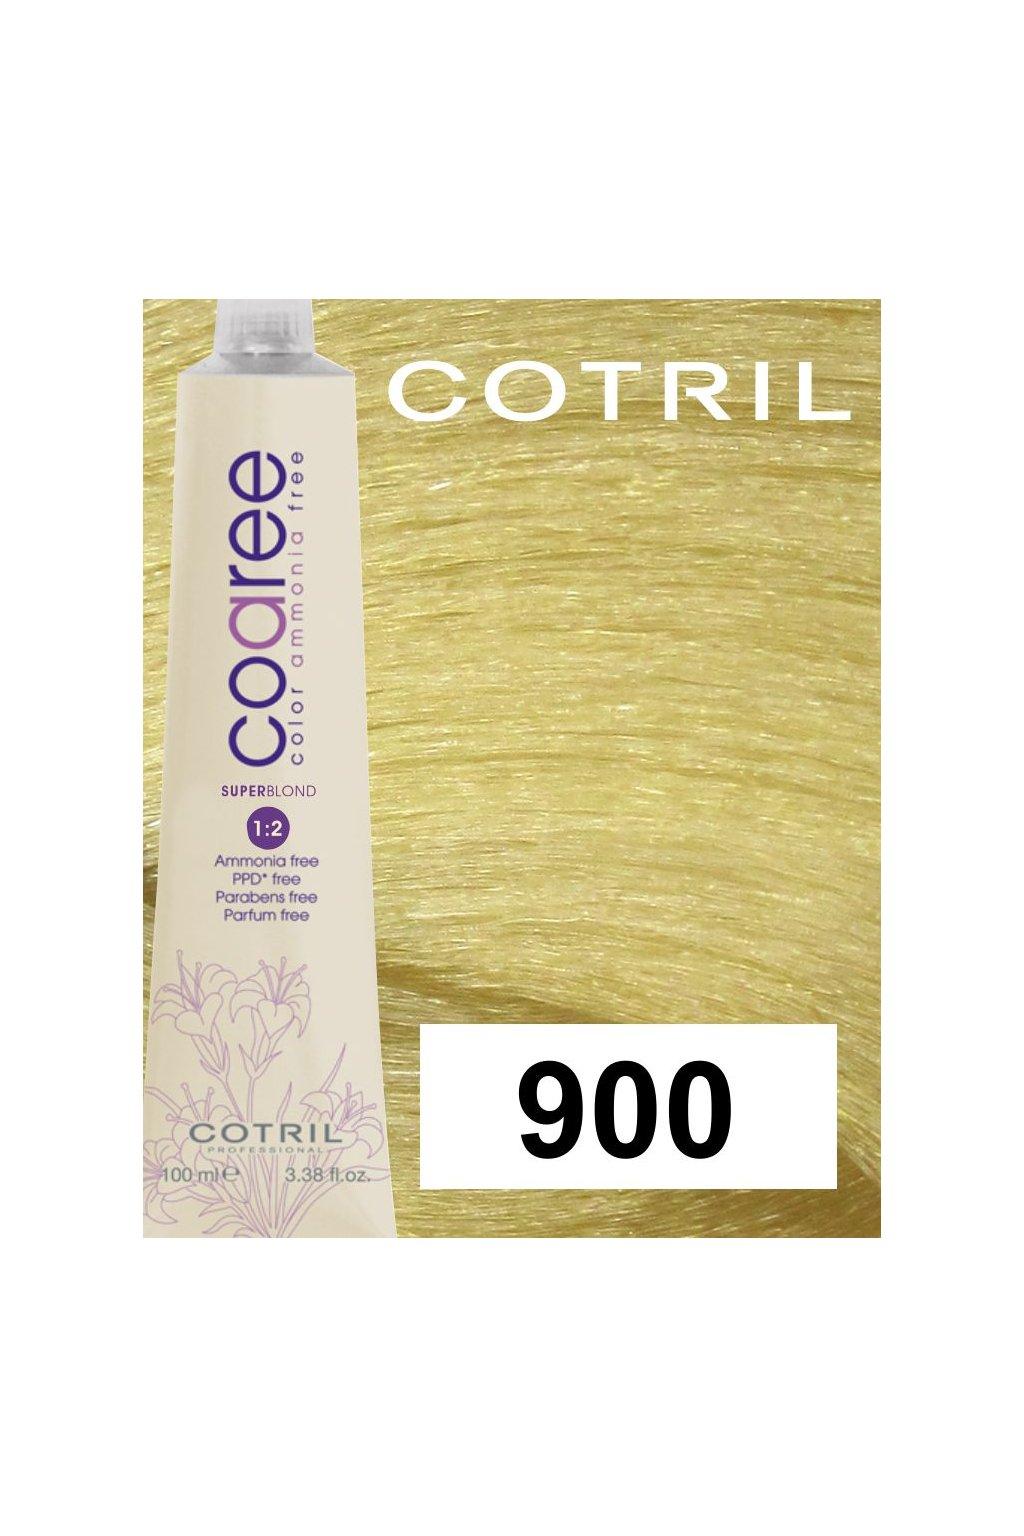 900 coaree